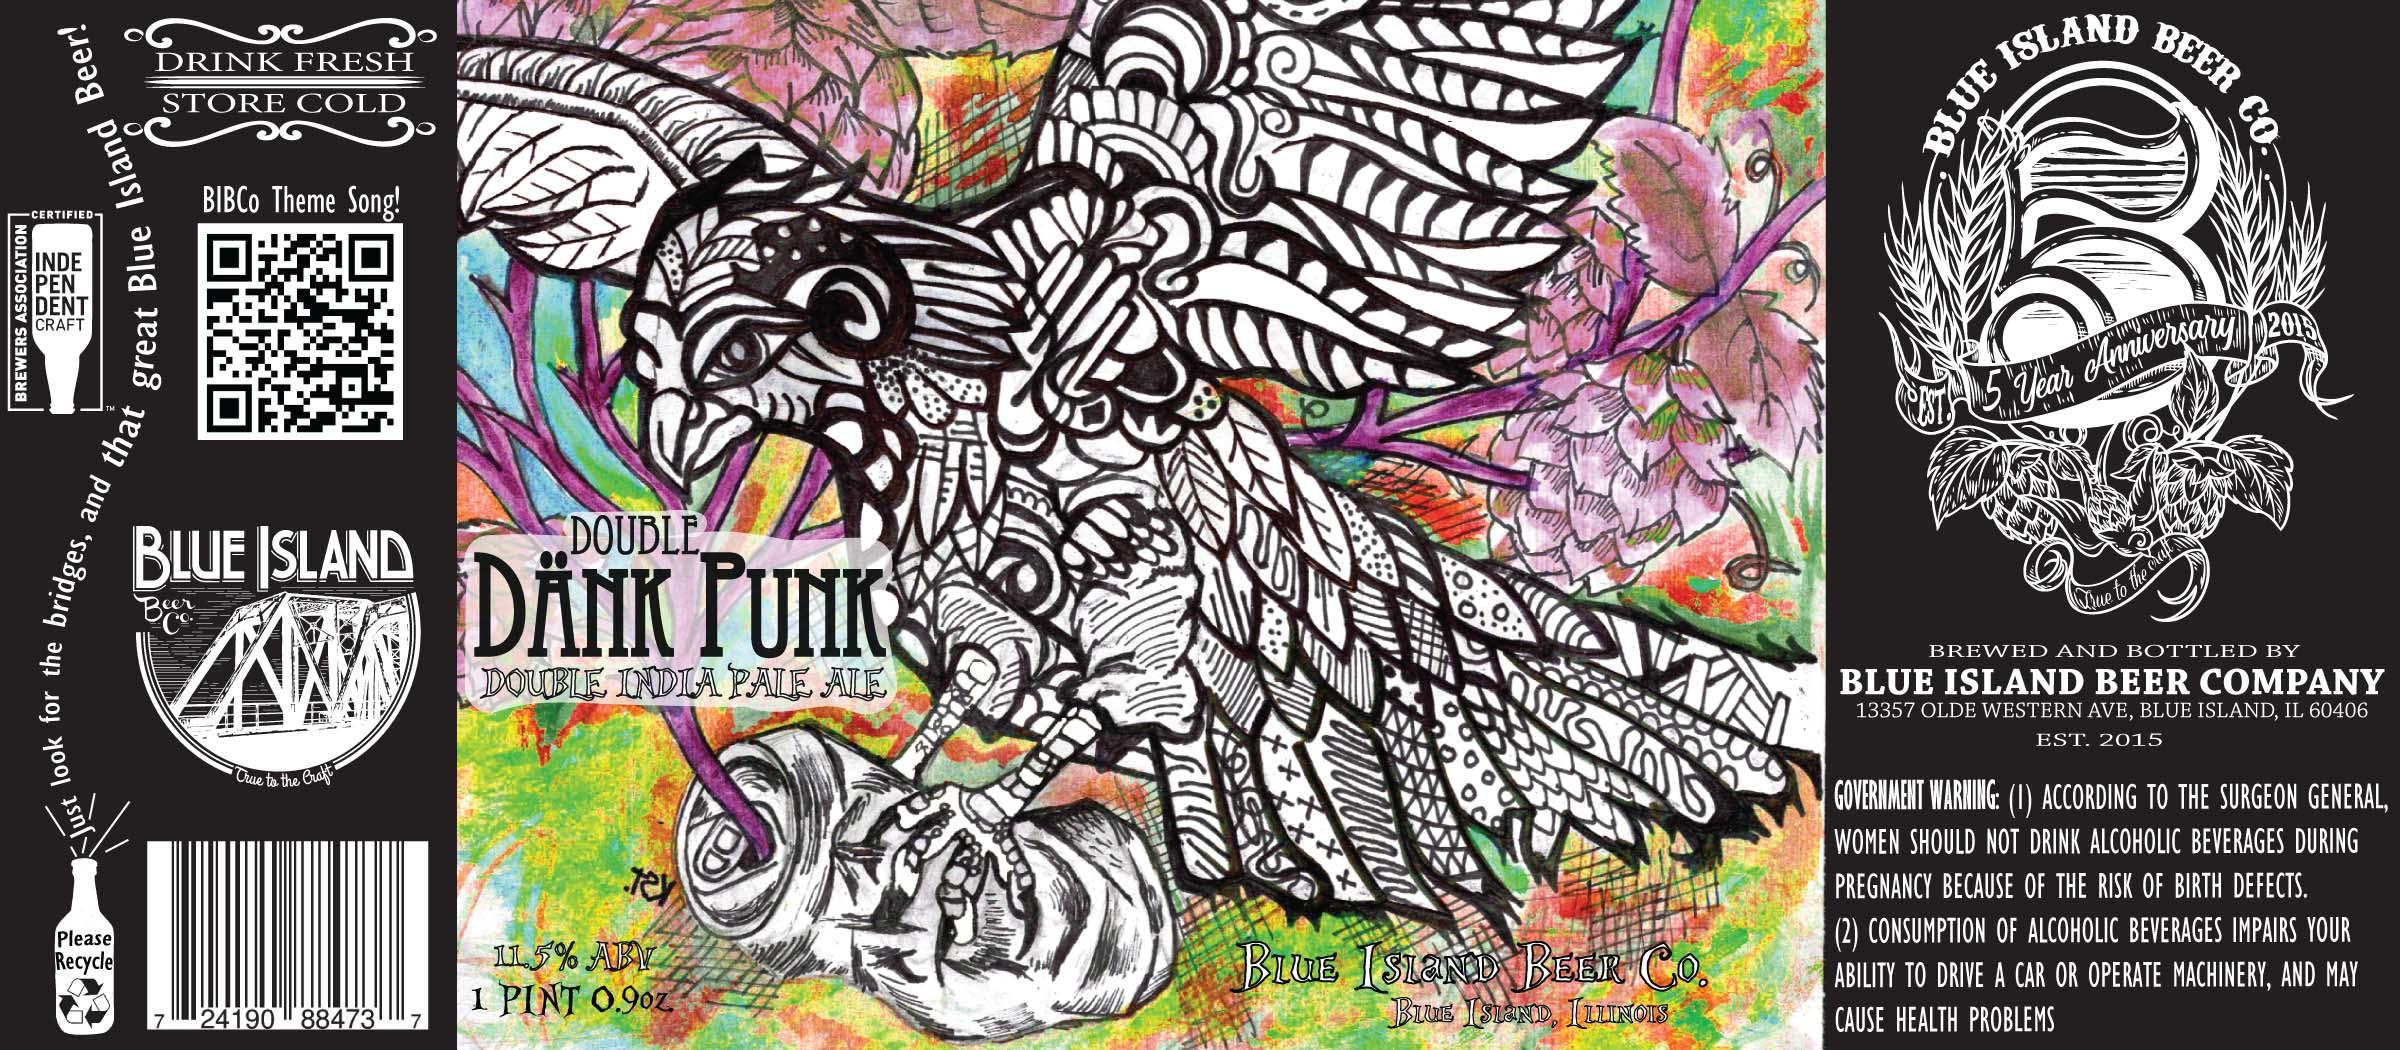 Double Dänk Punk